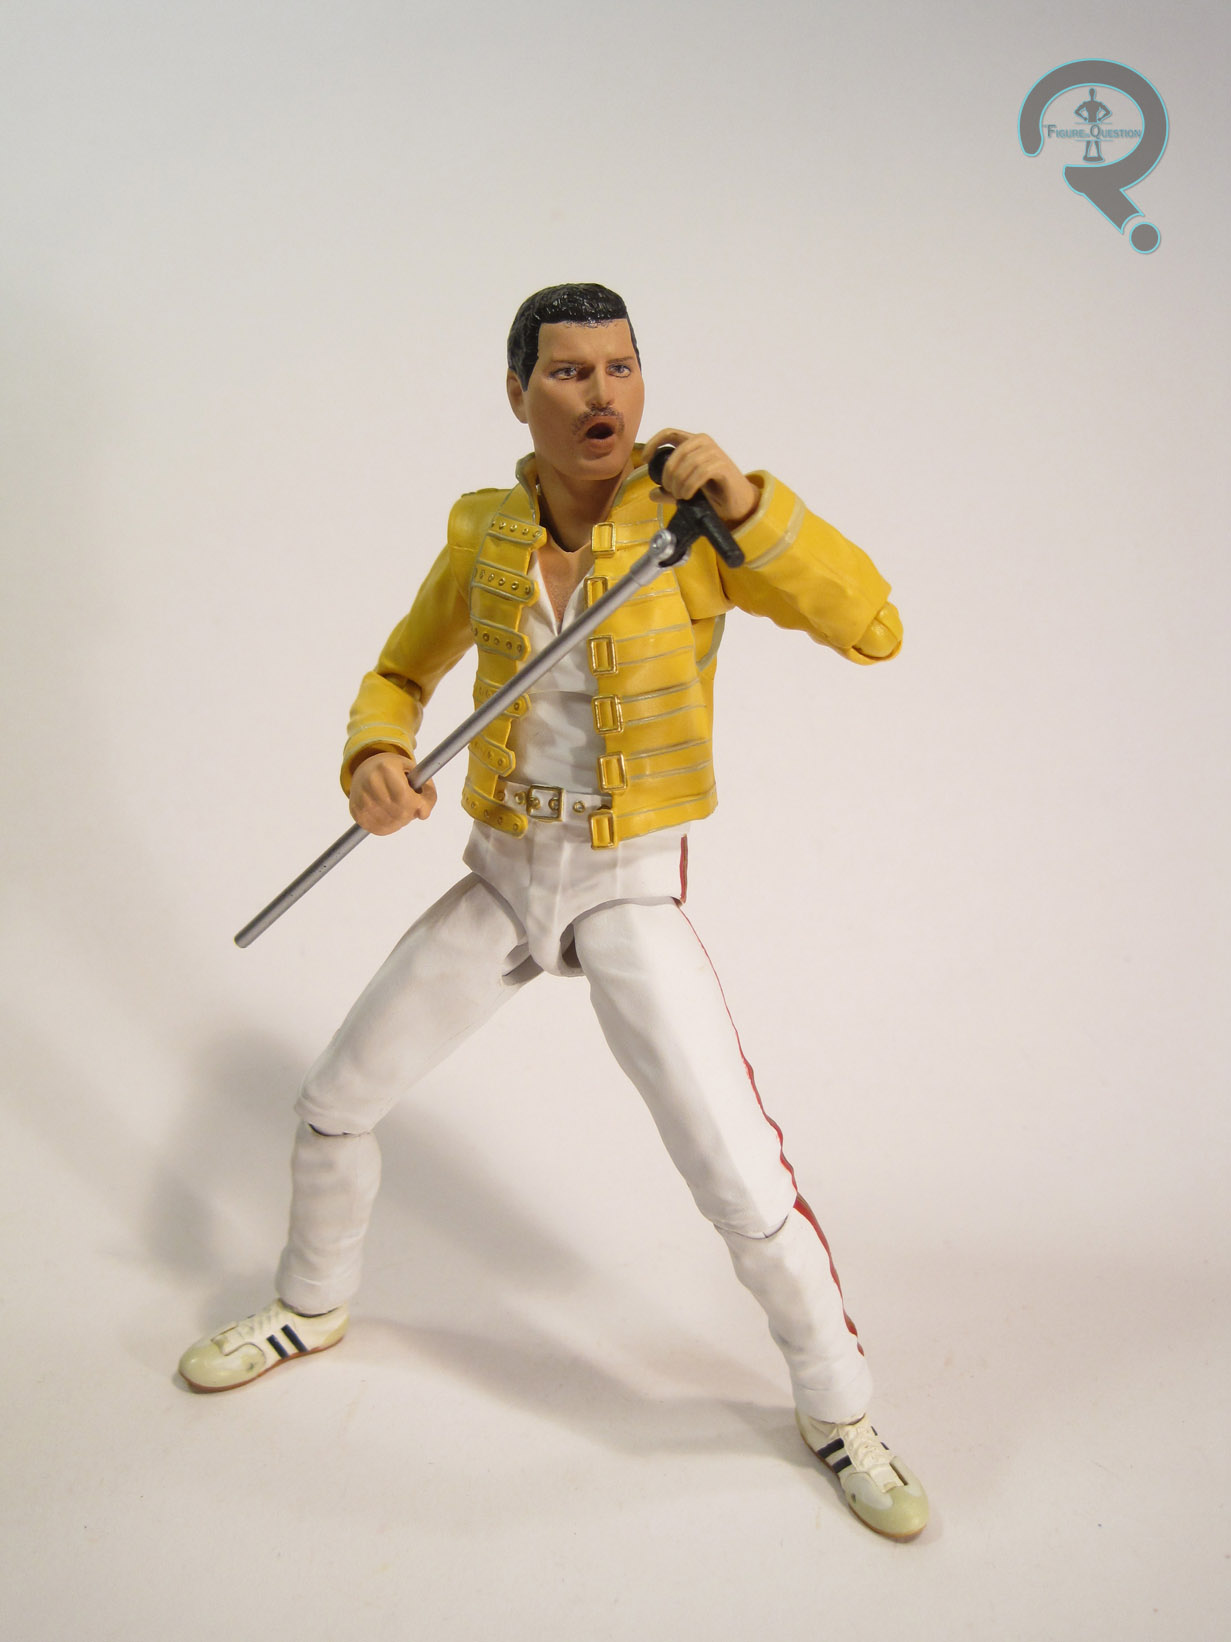 Freddie Mercury | The Figure In Question